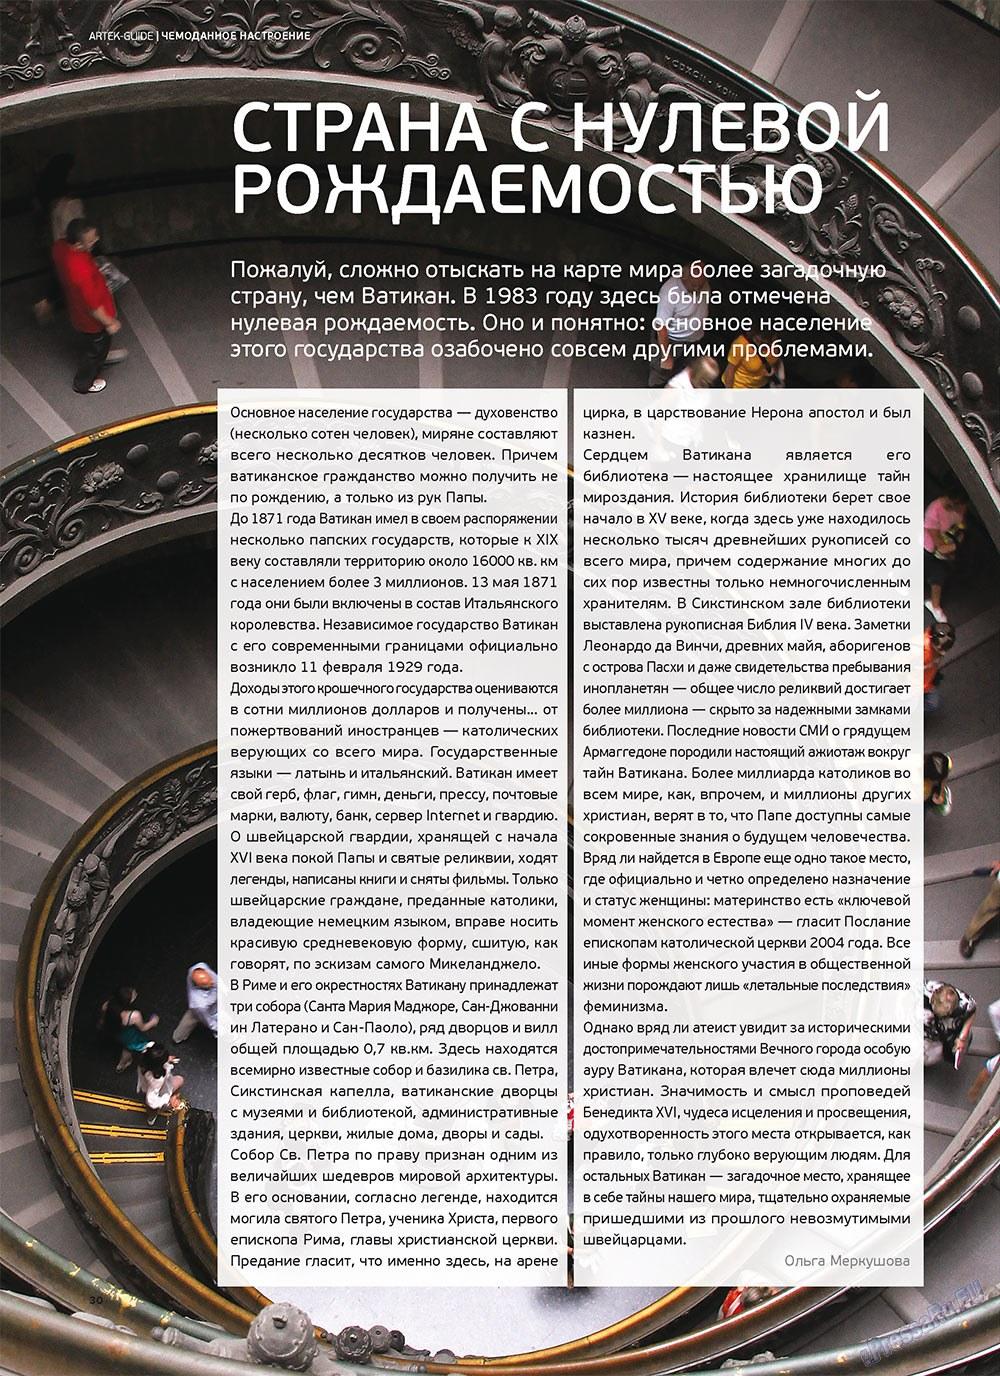 Артек (журнал). 2011 год, номер 4, стр. 32